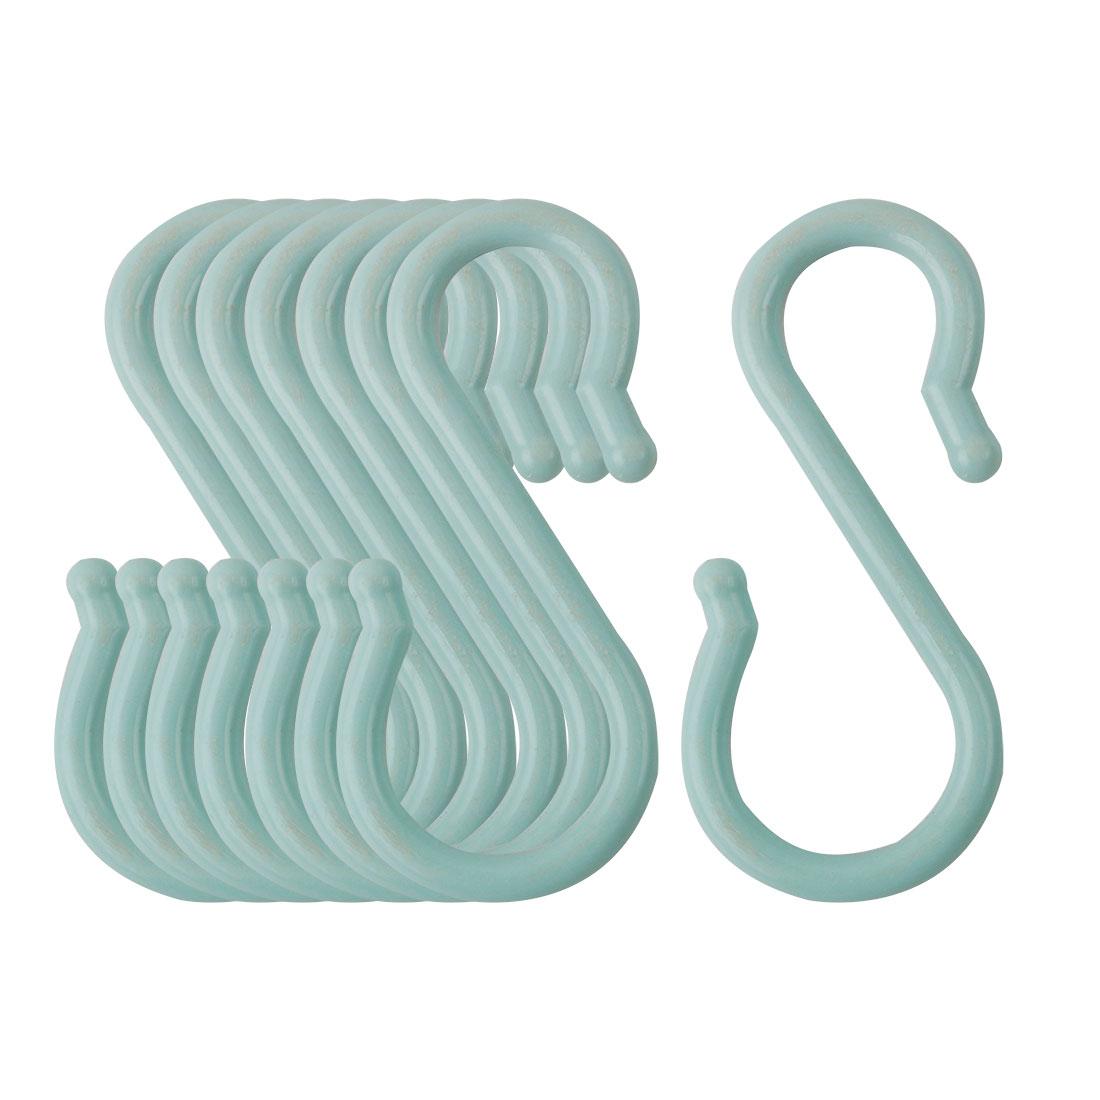 8 Pack S Hook Plastic Hanging Closet Utensils Coat Towel Hanger Light Blue